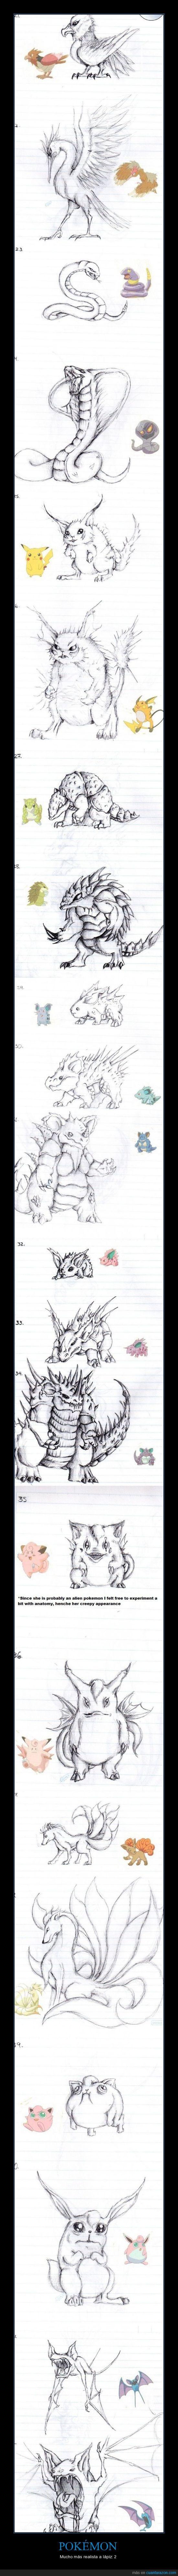 dibujo,infancia,mola,pokémon,realista,reinventado